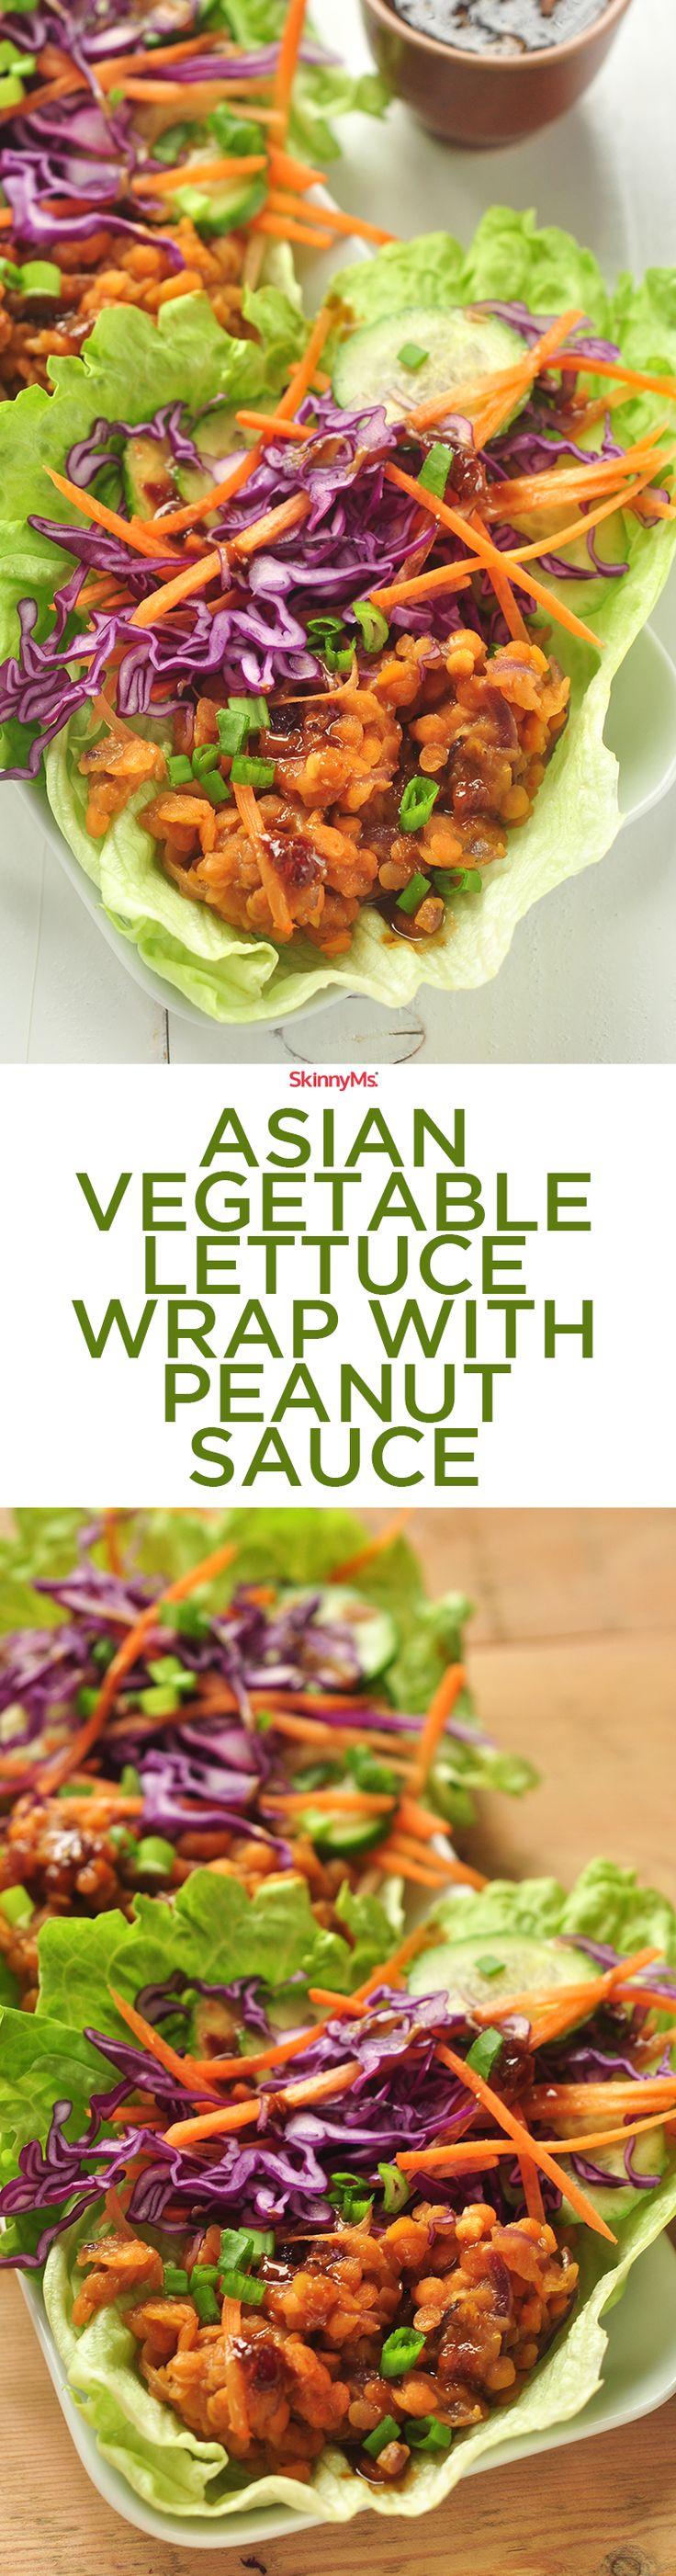 Asian Vegetable Lettuce Wrap with Peanut Sauce! :)